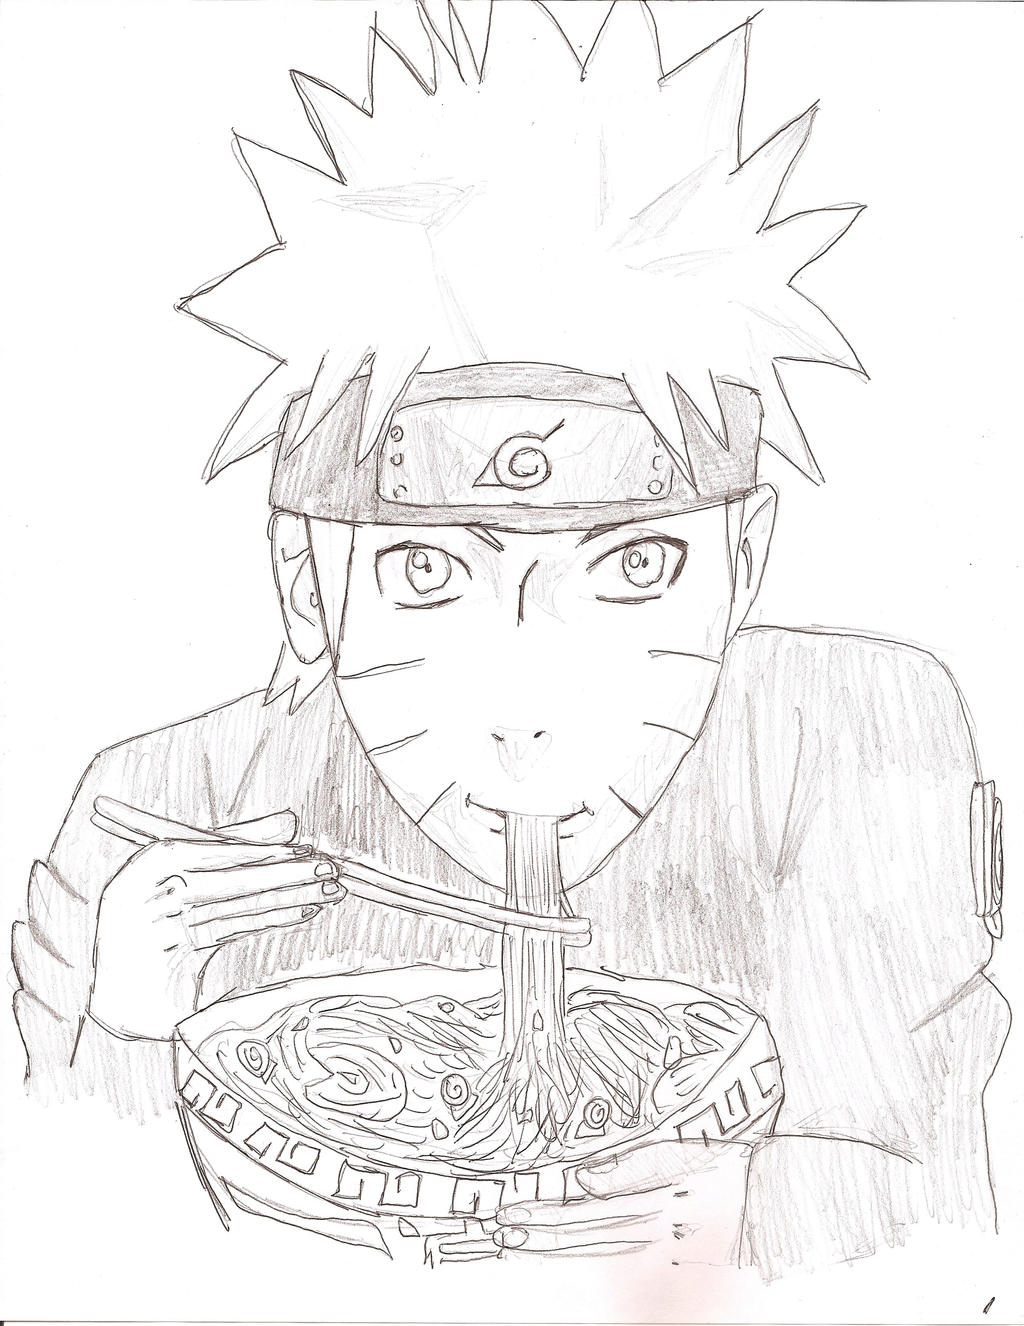 naruto eating ramen coloring pages - photo#26